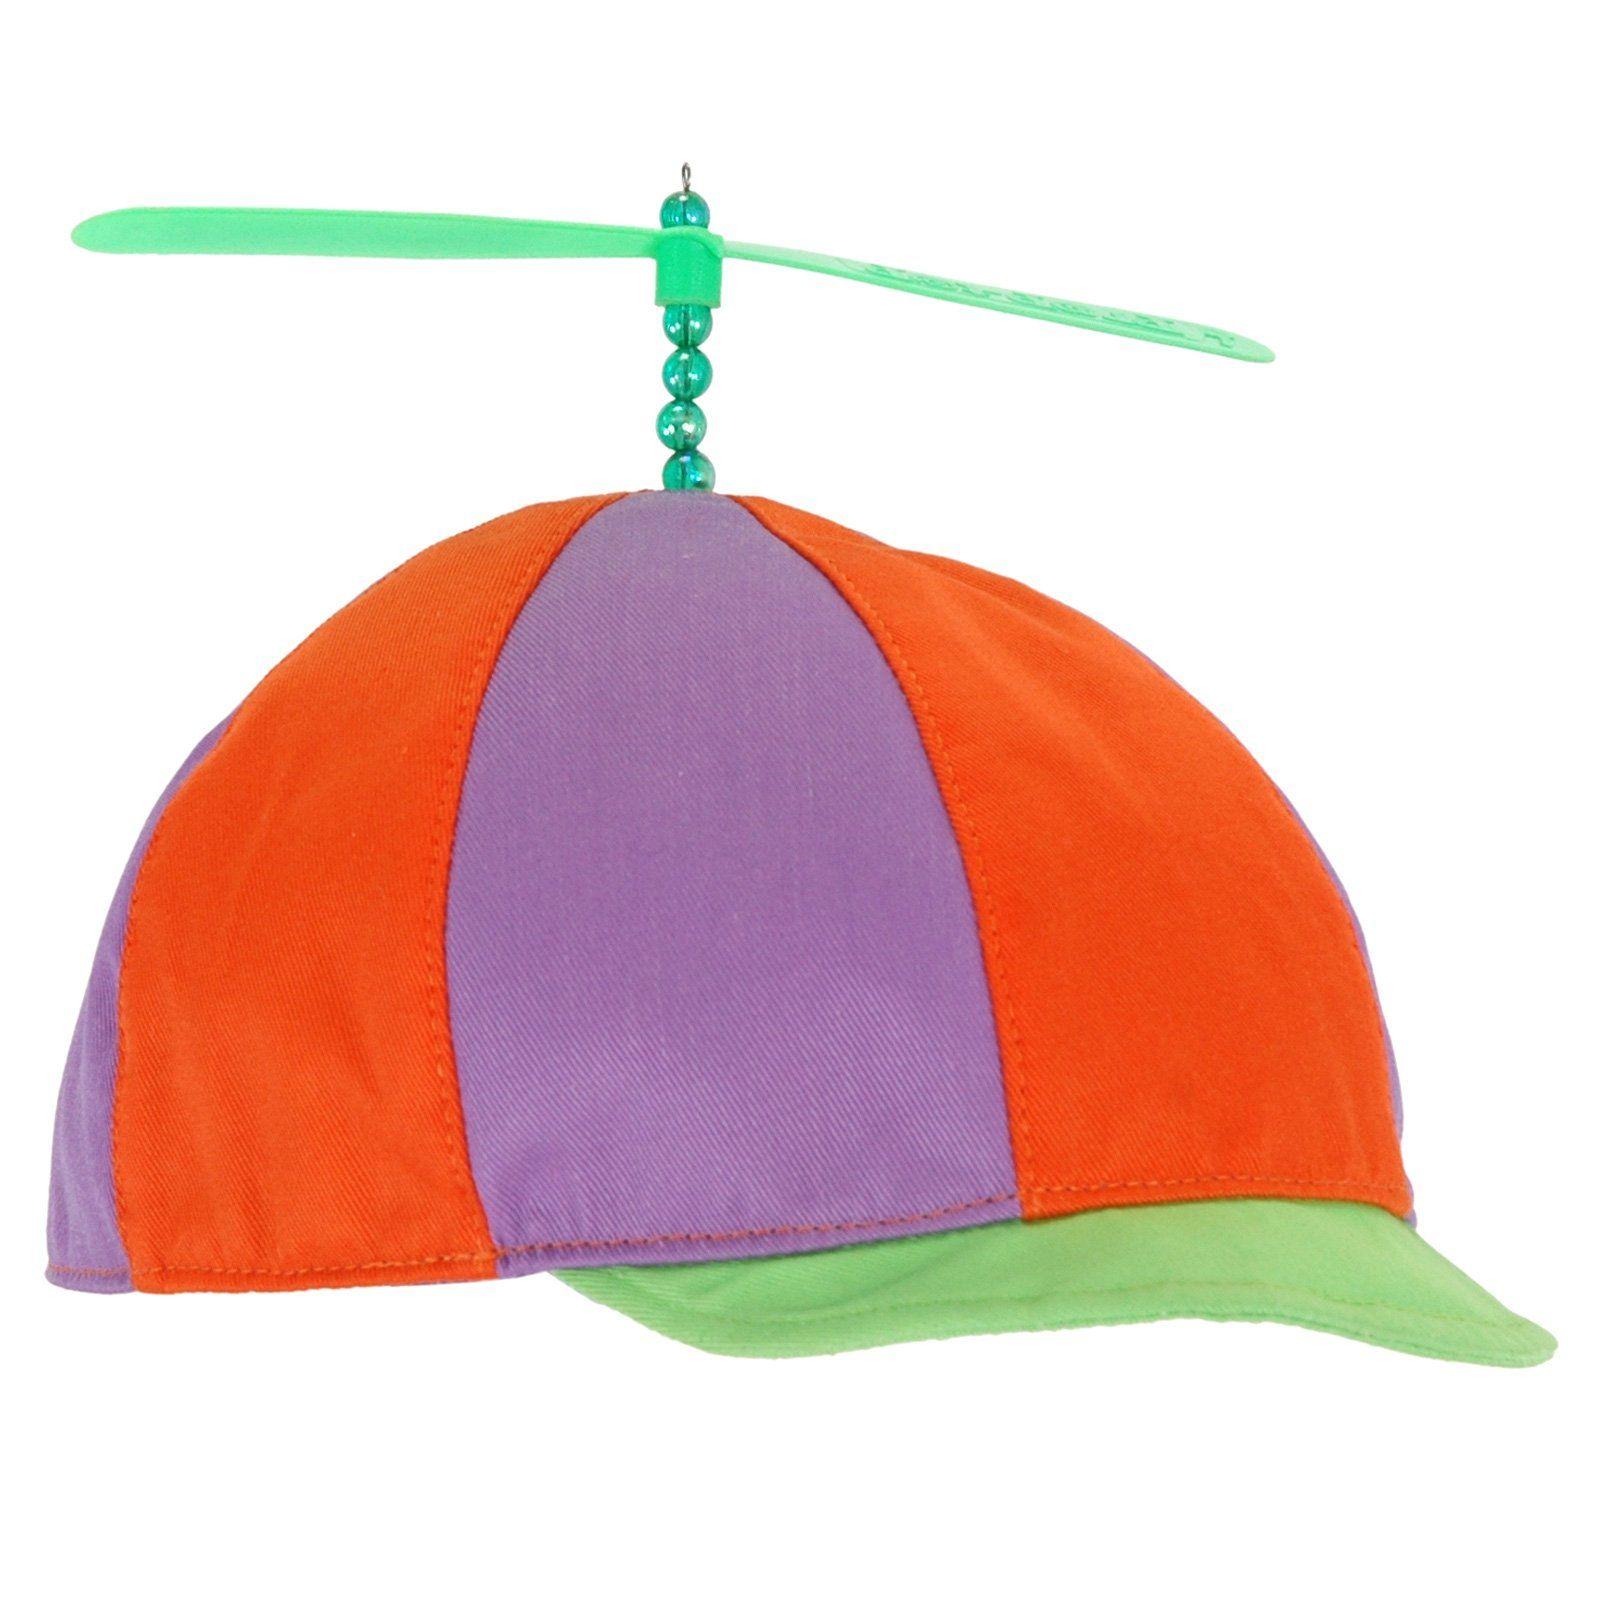 Alice in Wonderland Classic Tweedledee / Tweedledum Hat - Adult